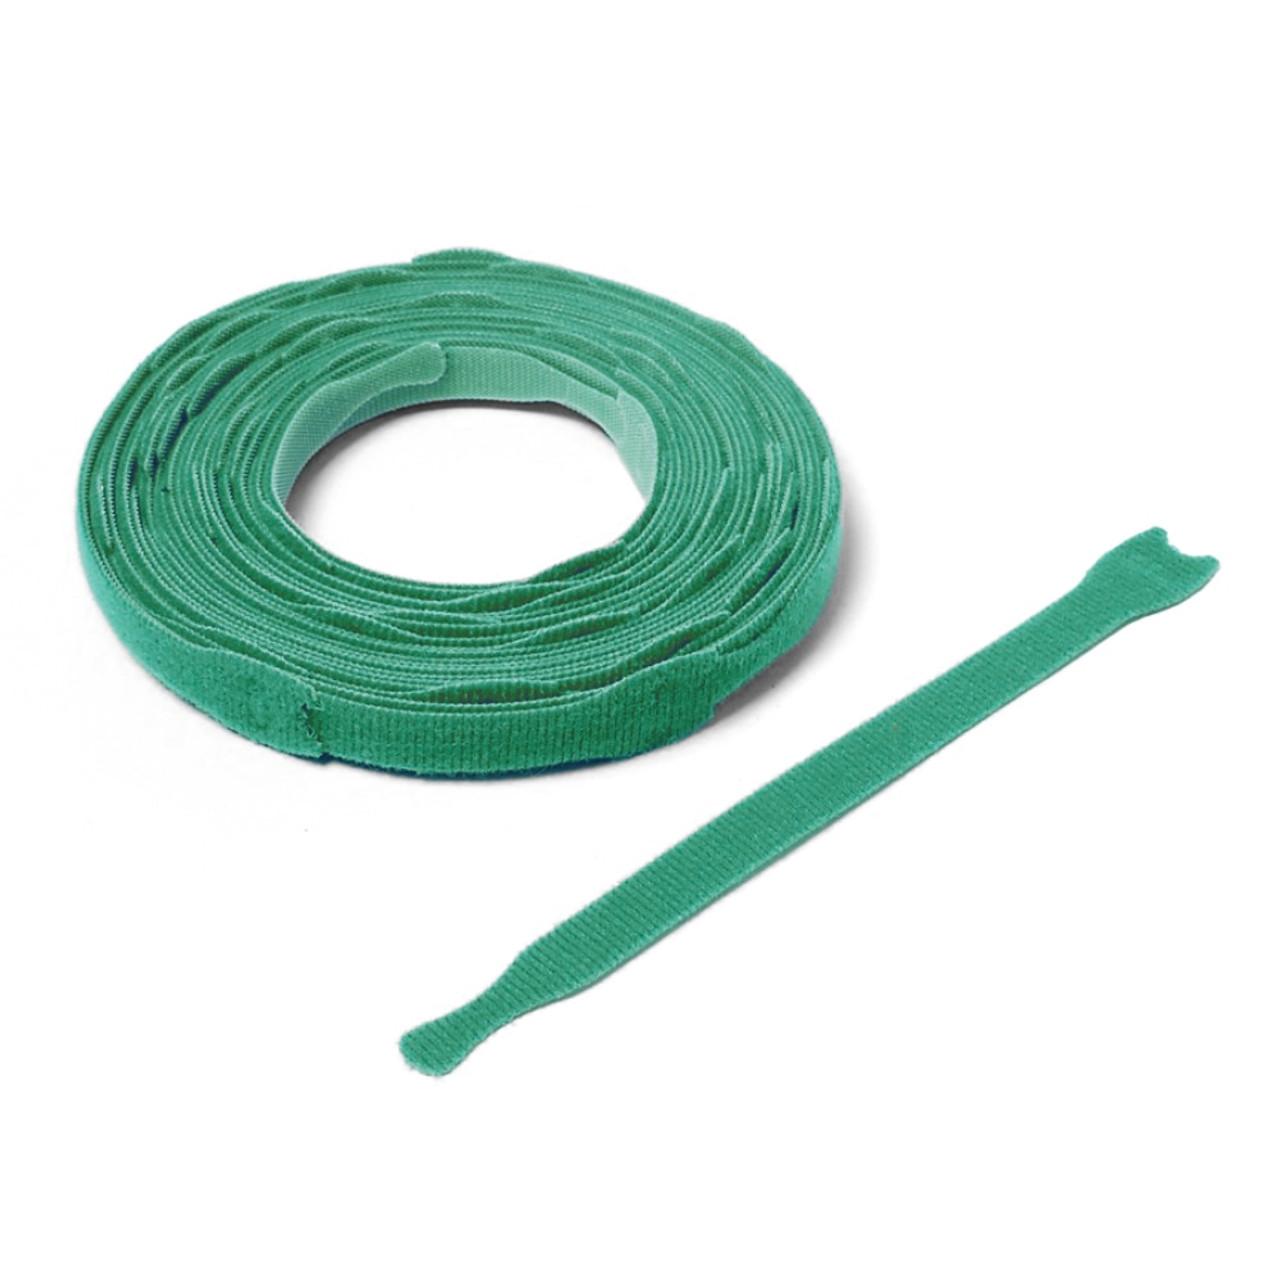 VELCRO ® Brand ONE-WRAP ® Die-Cut Straps - Green / Velcro Straps - Bundling Straps - Velcro Tie - Velcro Strap